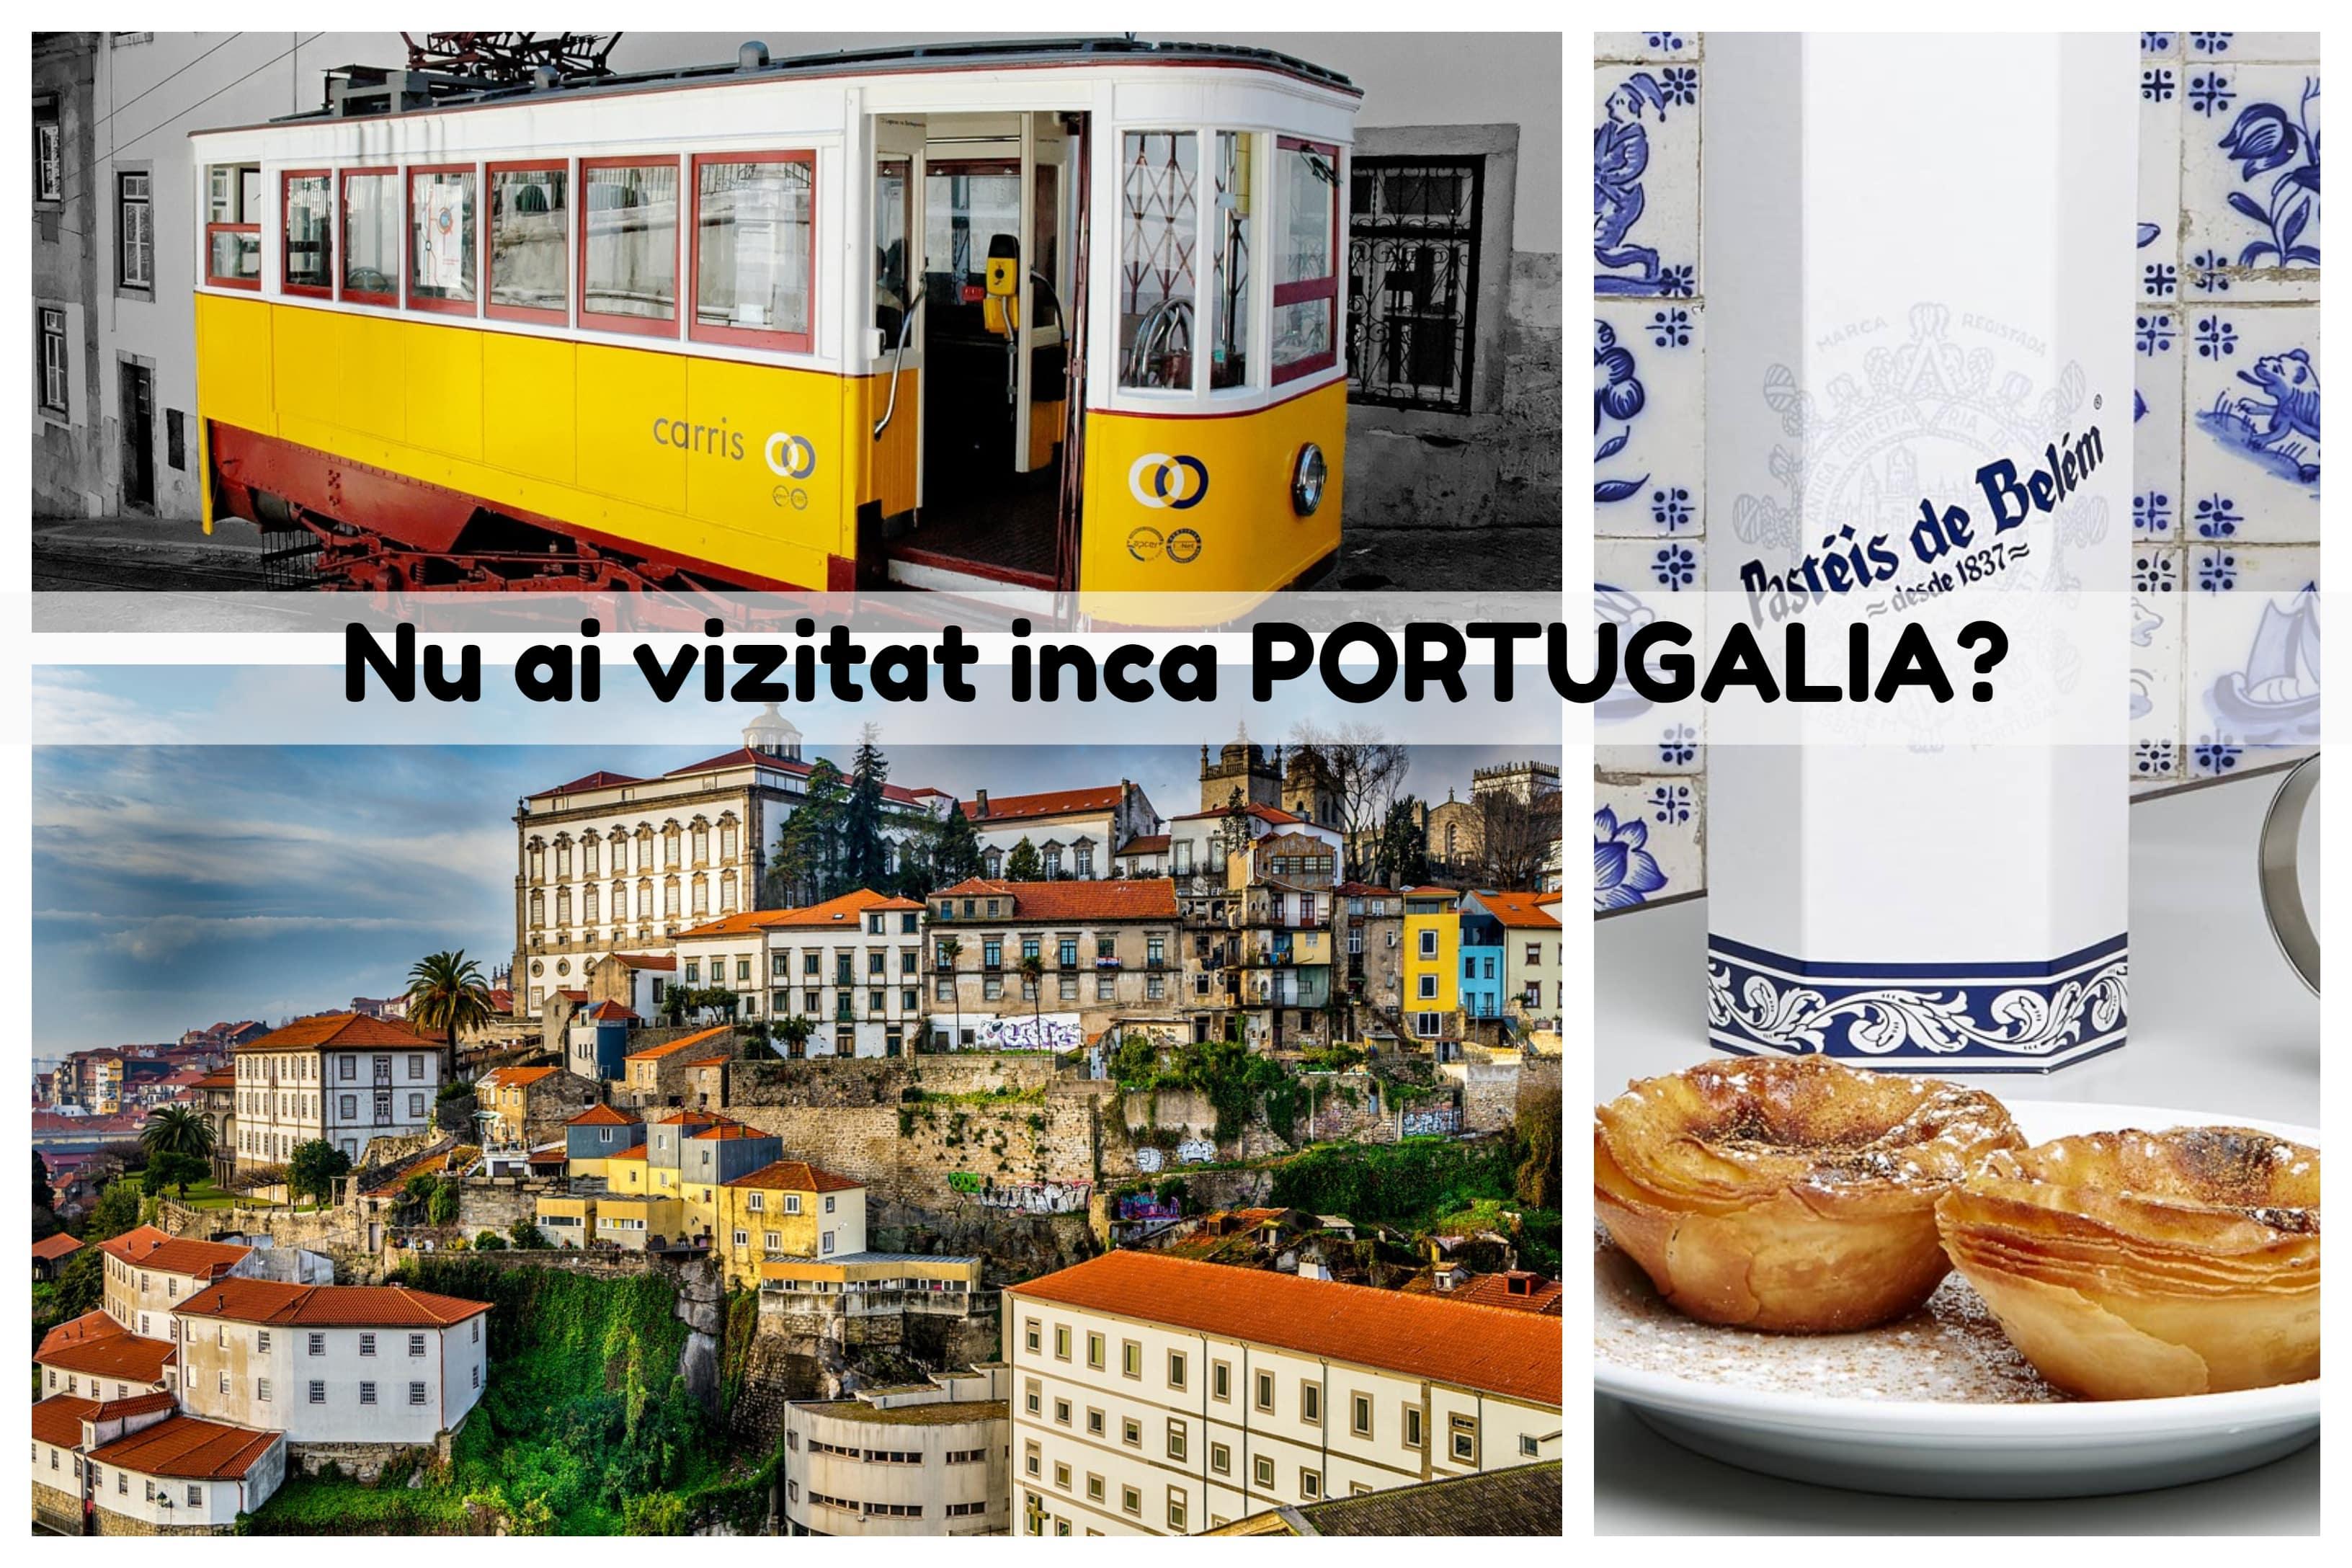 Imagini din Lisabona si Porto, destinatii din Portugalia acoperite de KLM